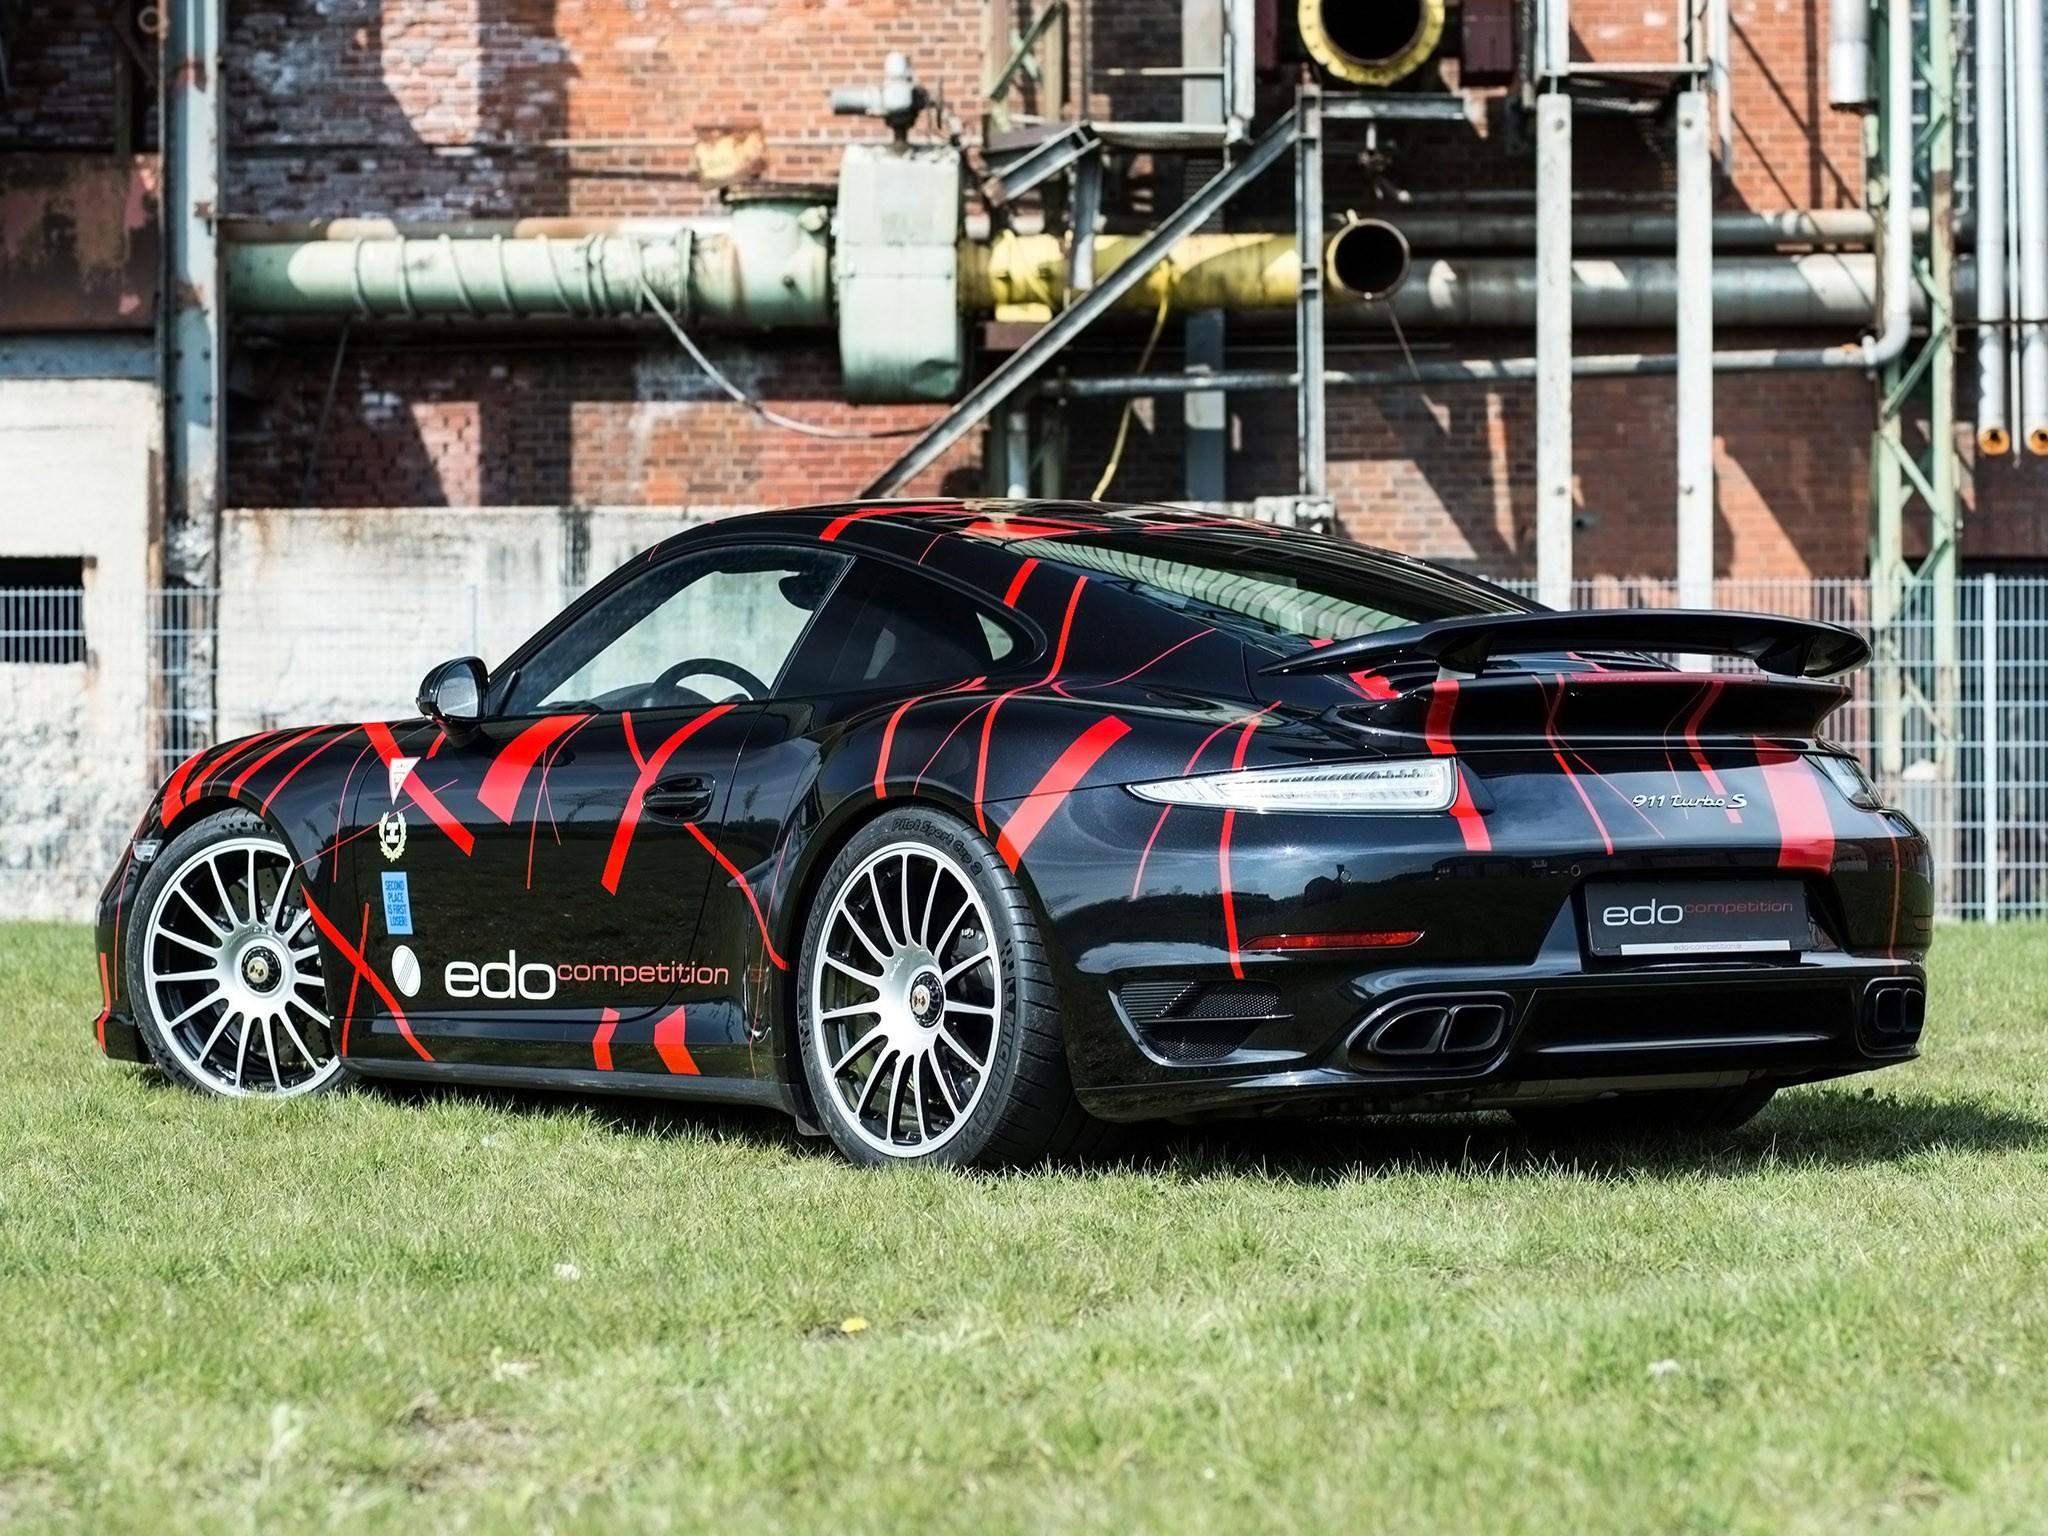 2014 Edo Competition - Porsche 991 Turbo S